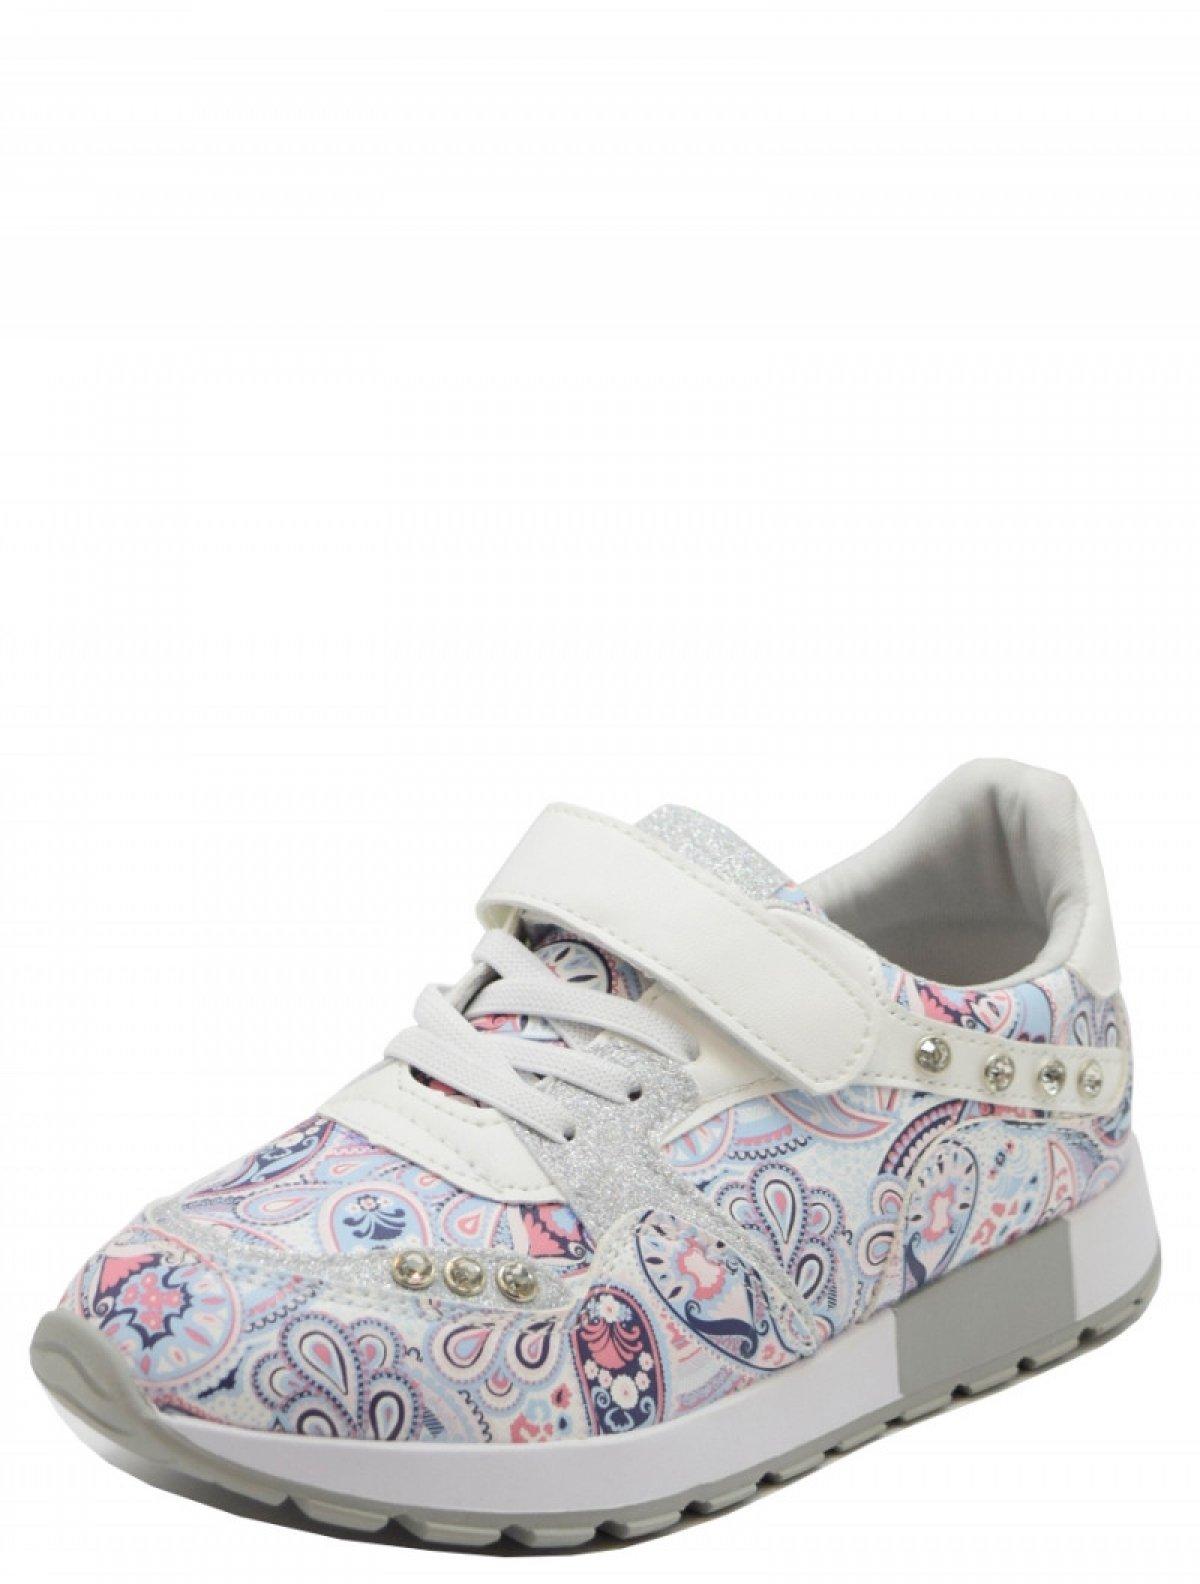 Капитошка E8985 кроссовки для девочки